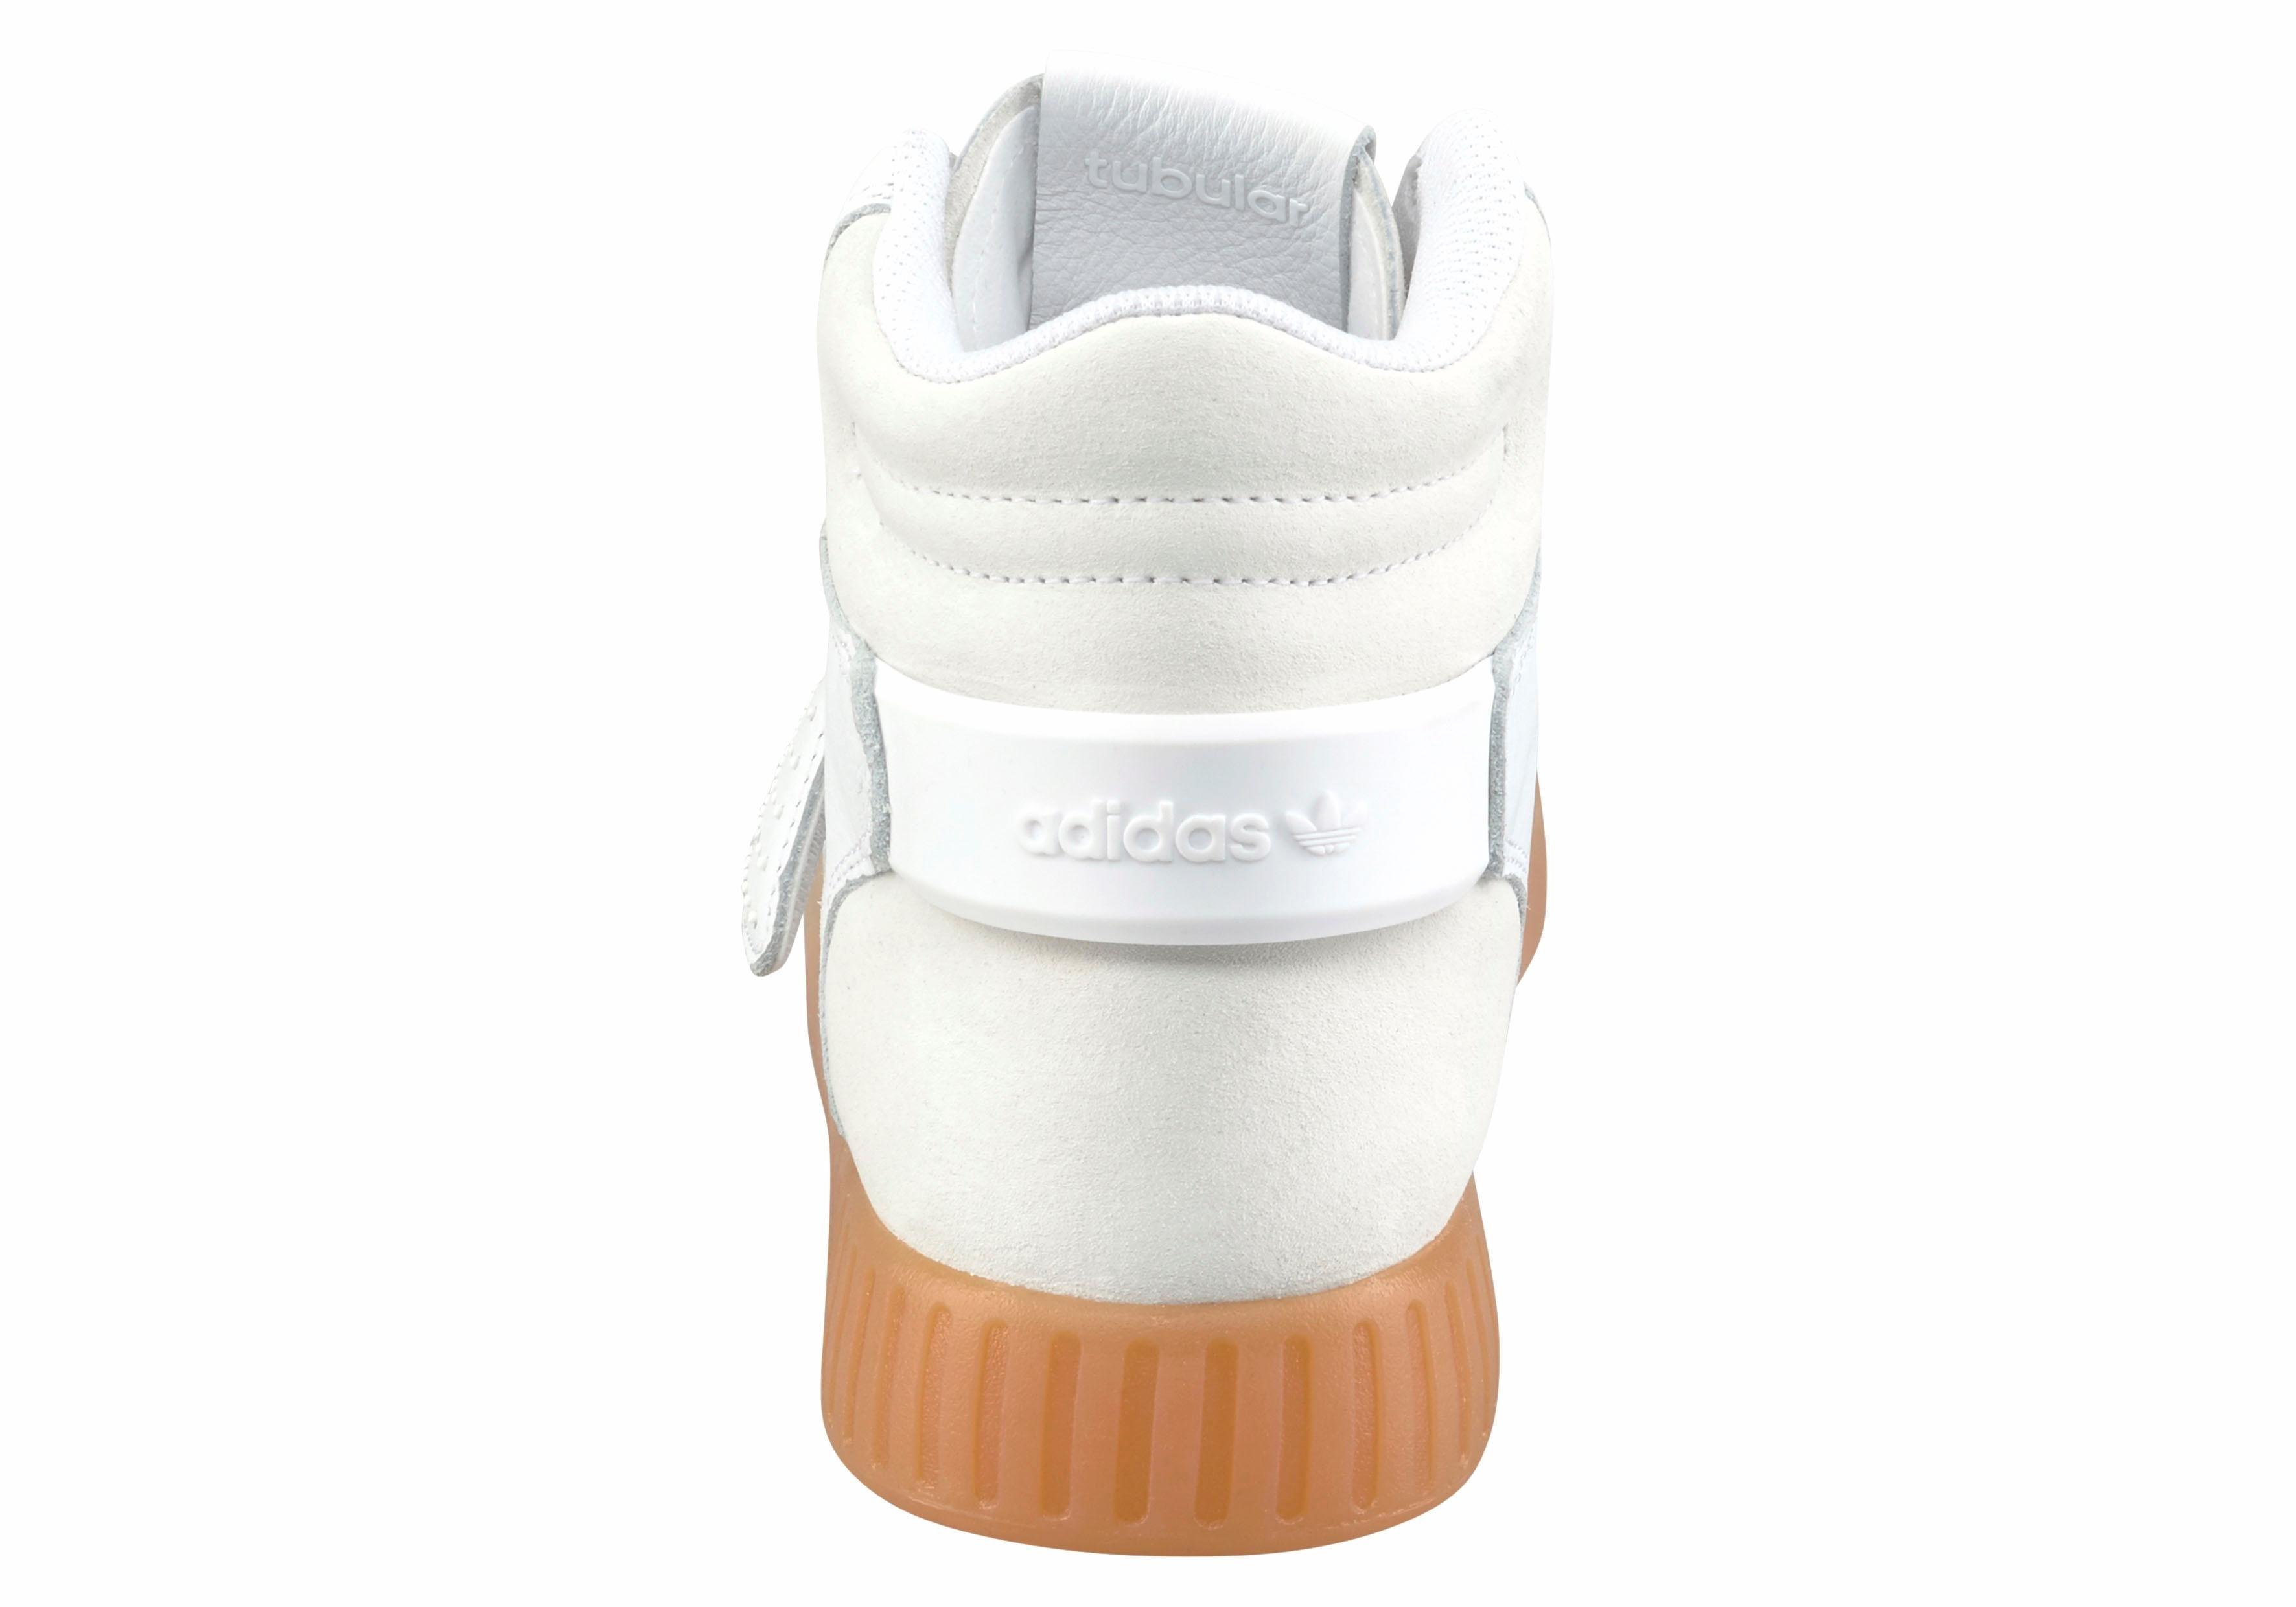 Invader Adidas StrBestel Sneakerstubular Bij Originals Nu Yy67gbf